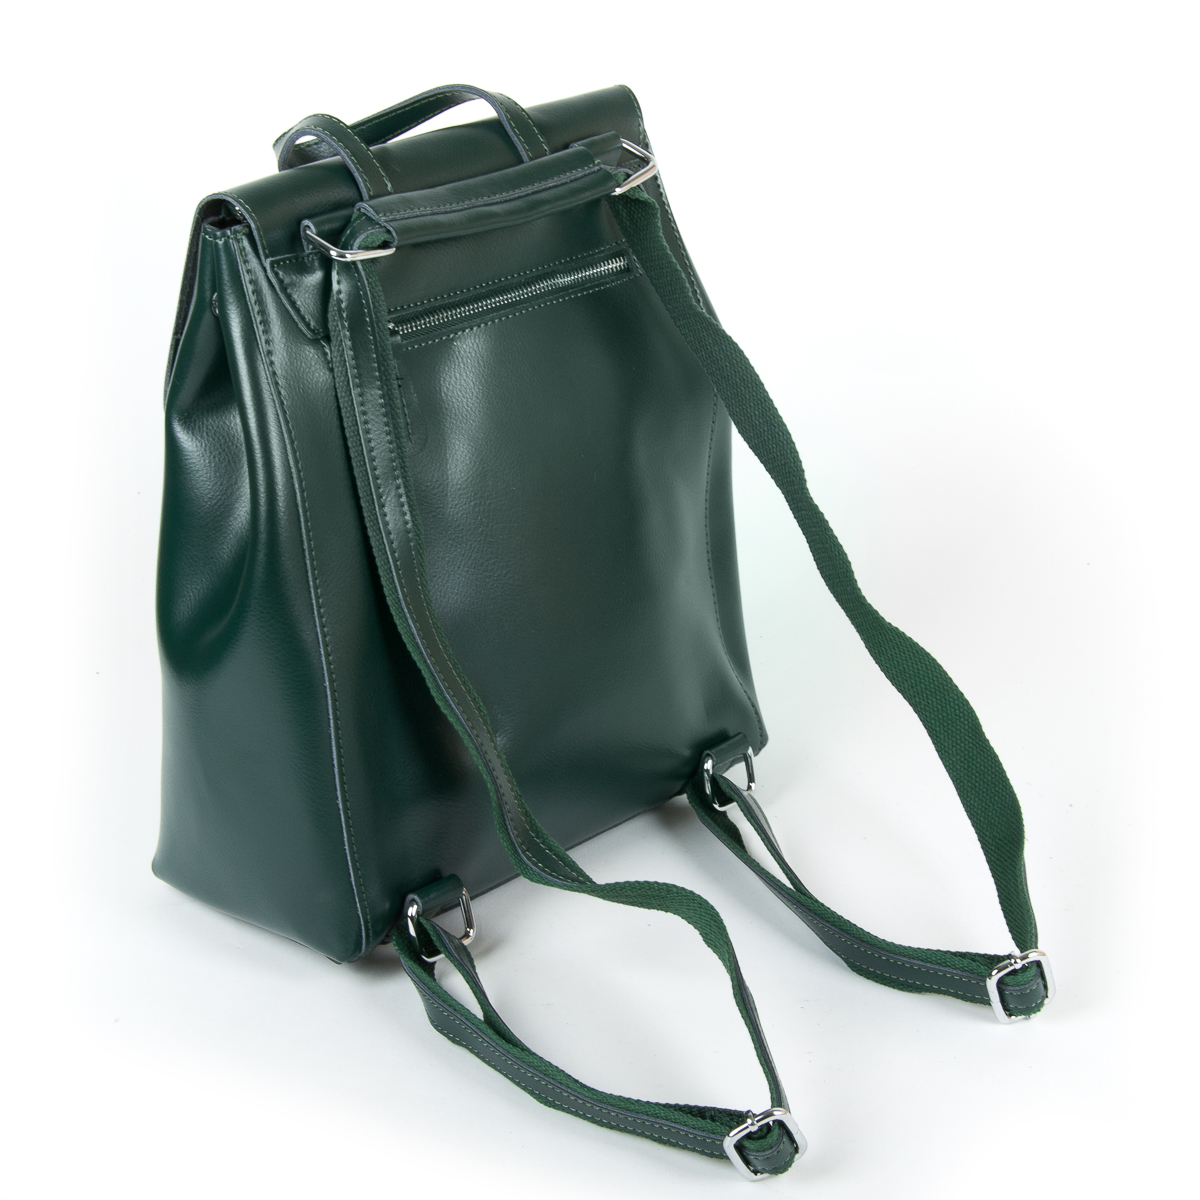 Сумка Женская Рюкзак кожа ALEX RAI 9-01 360 green - фото 4